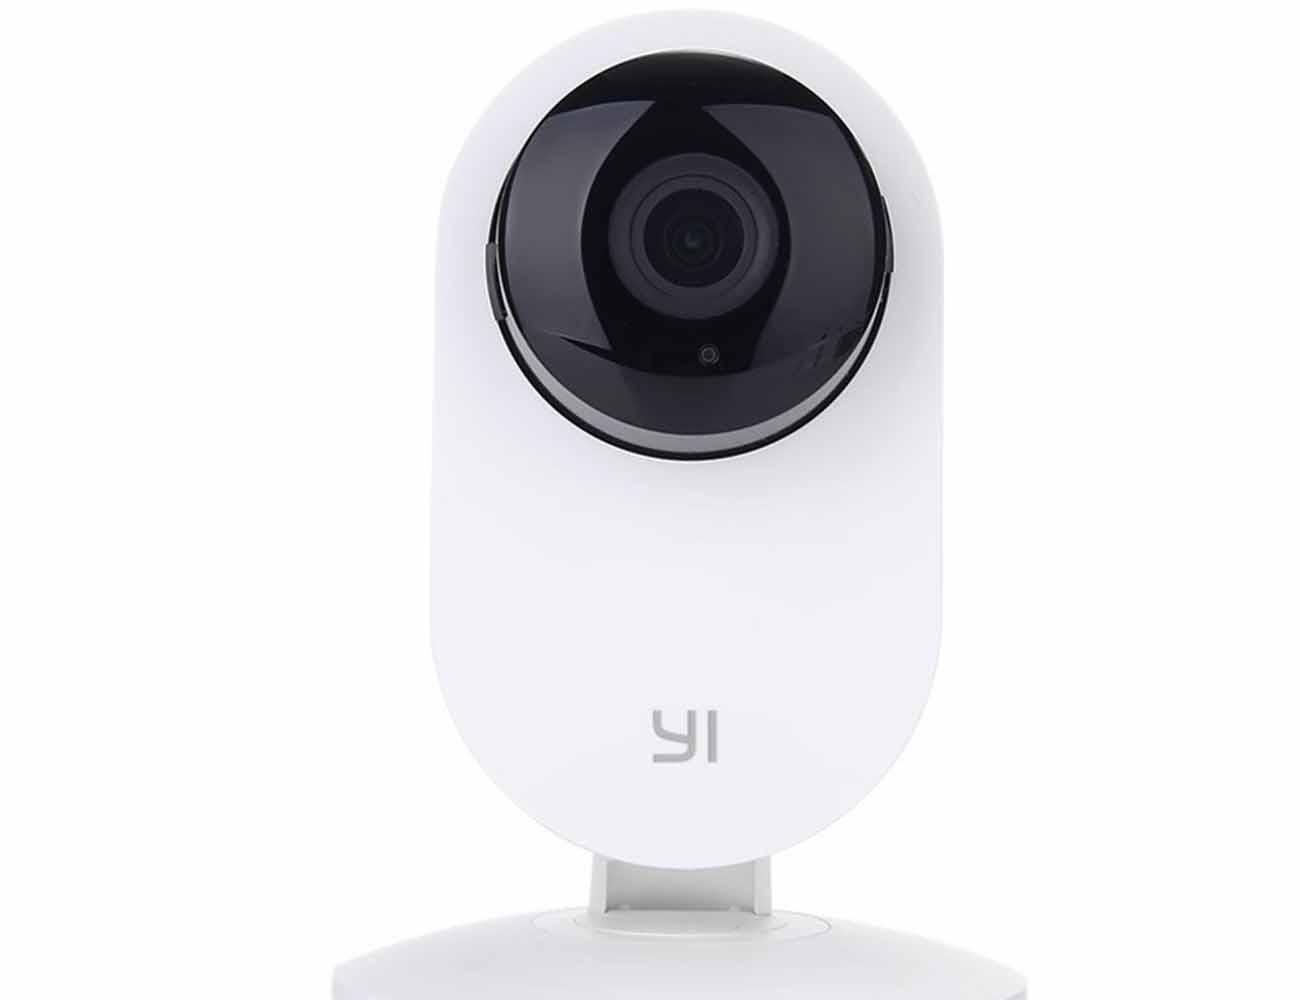 Yi Home Camera New Account